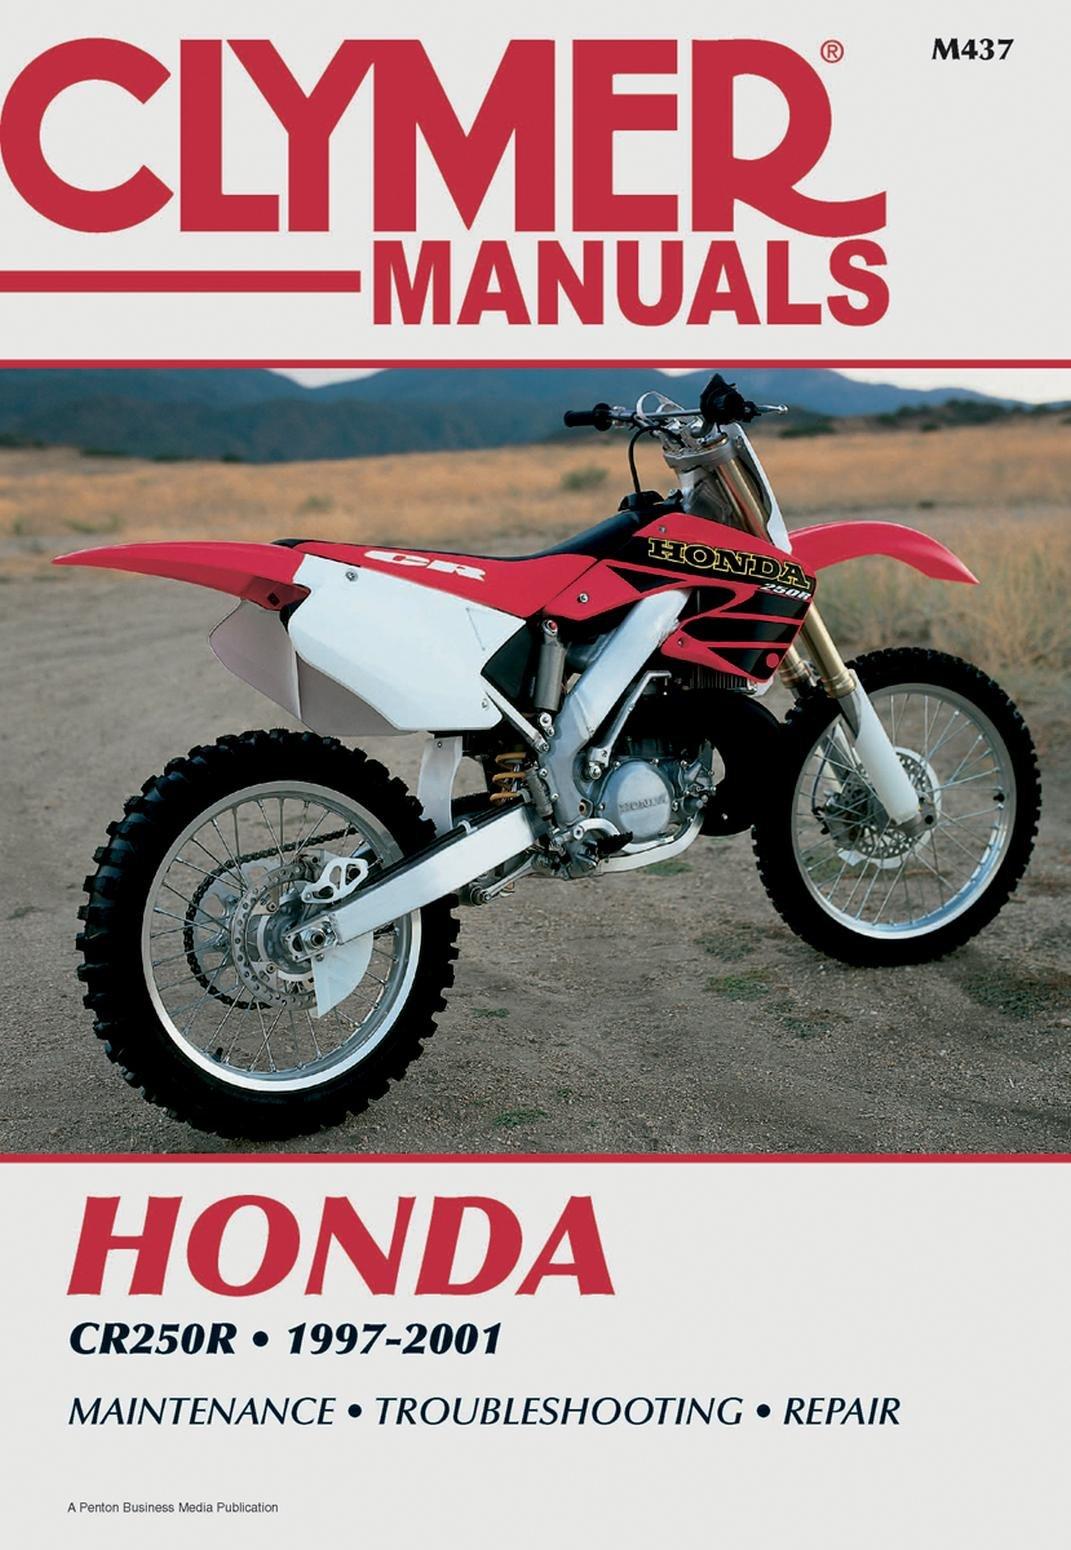 Clymer m437 manual hon cr250 (M437)